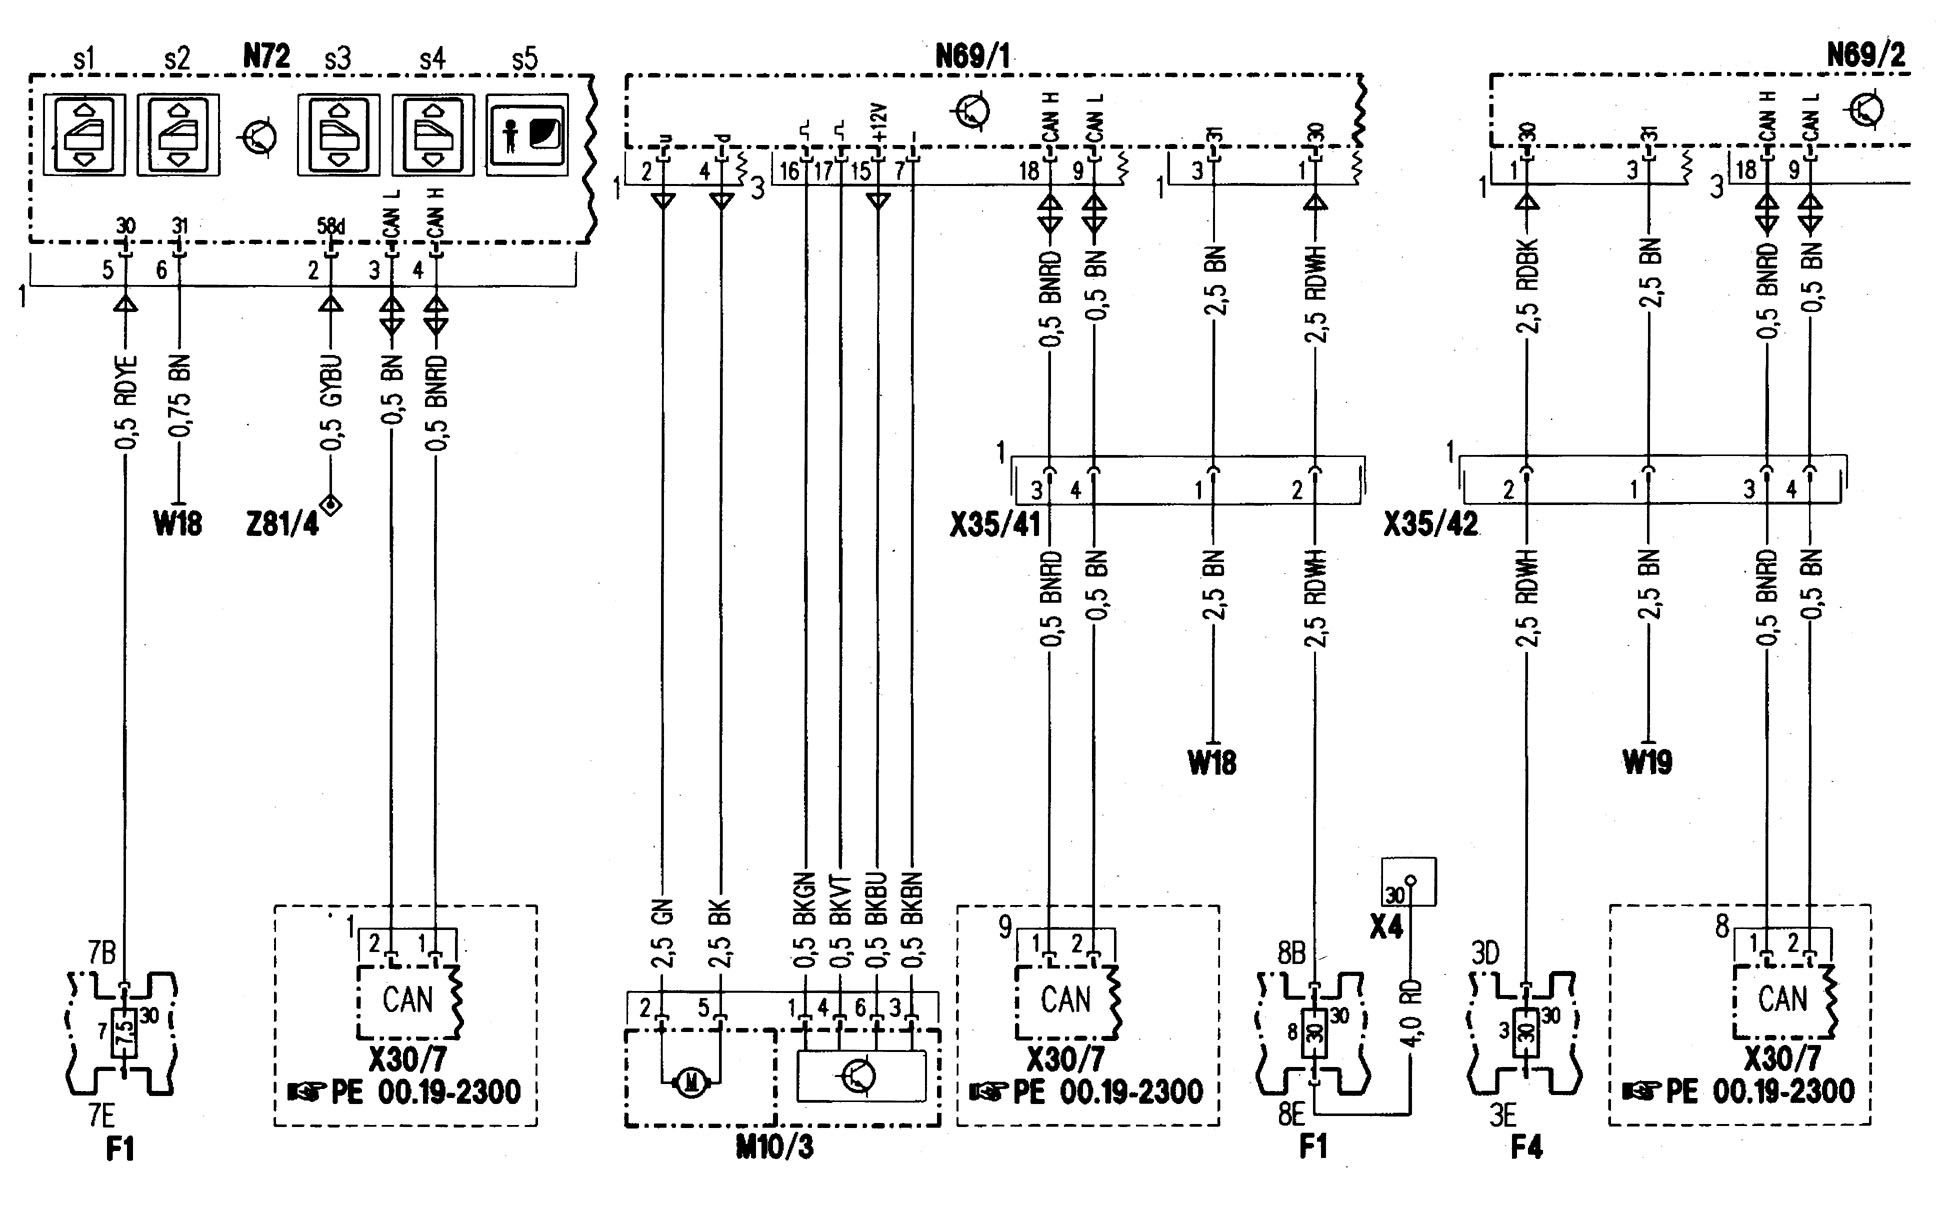 94 E420 Mercede Benz Wiring Diagram - Wiring Diagram Networks